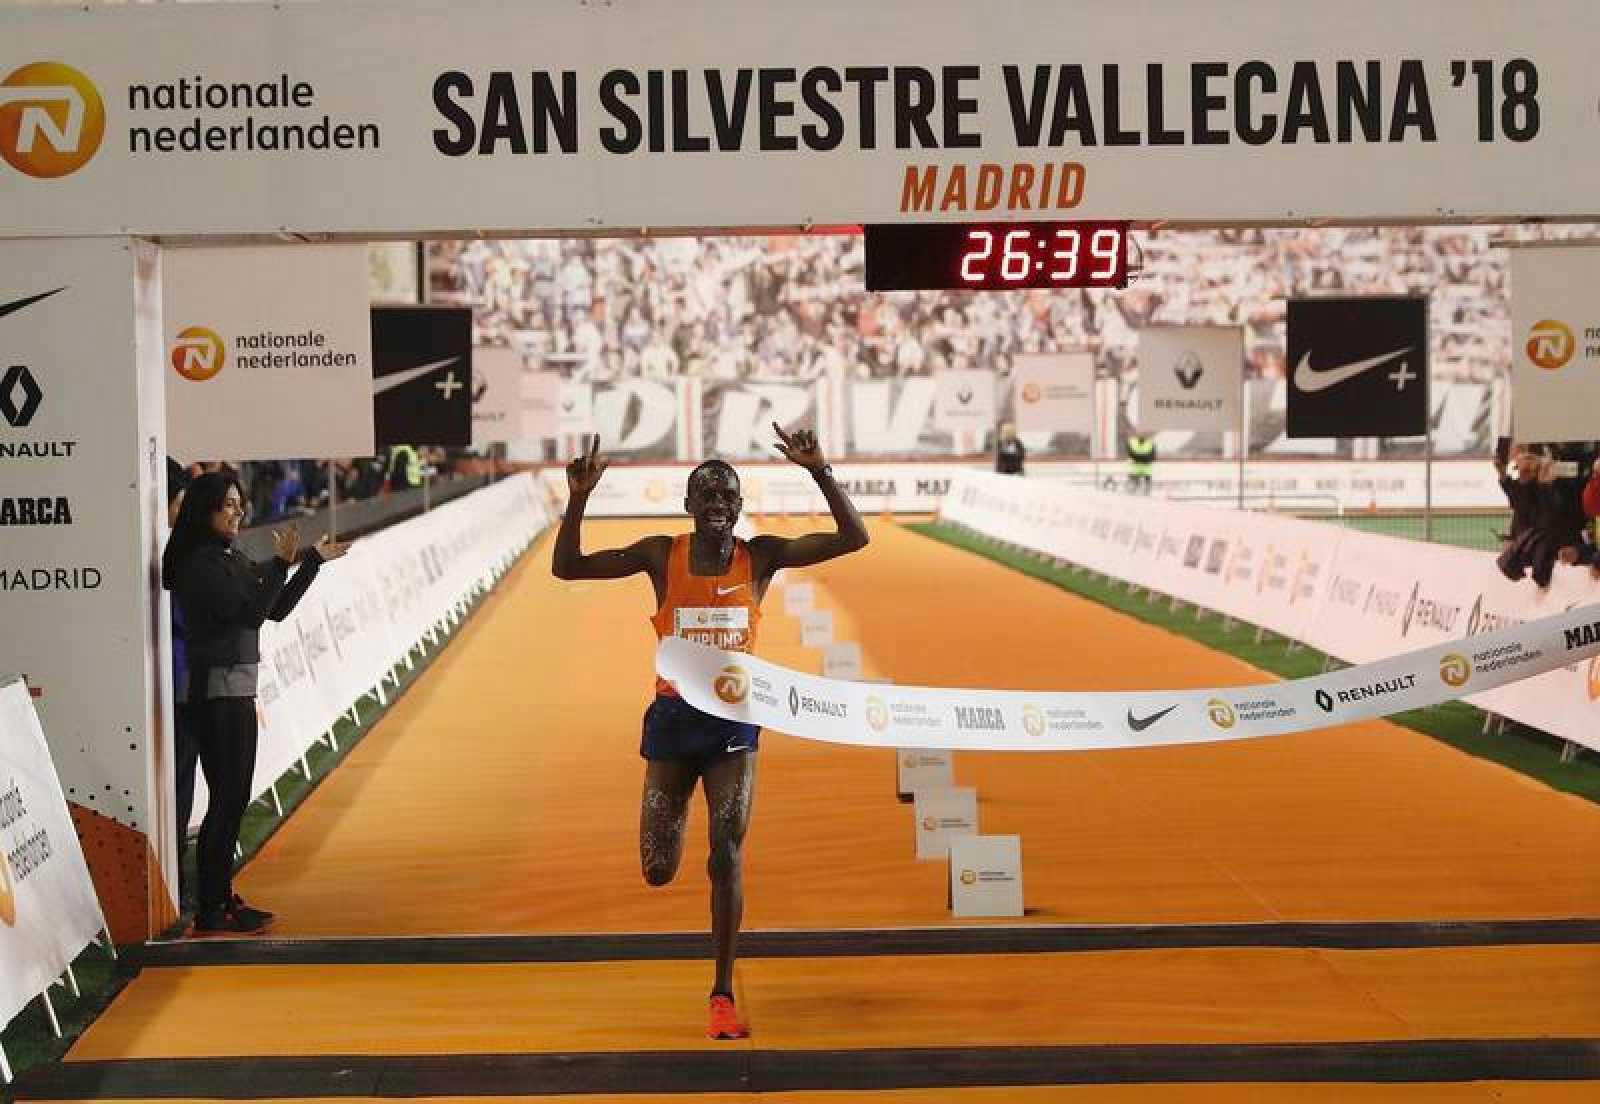 El ugandés Jacob Kiplimo entra vencedor en la San Silvestre Vallecana, la emblemática carrera de 10.000 metros del final de año en Madrid.